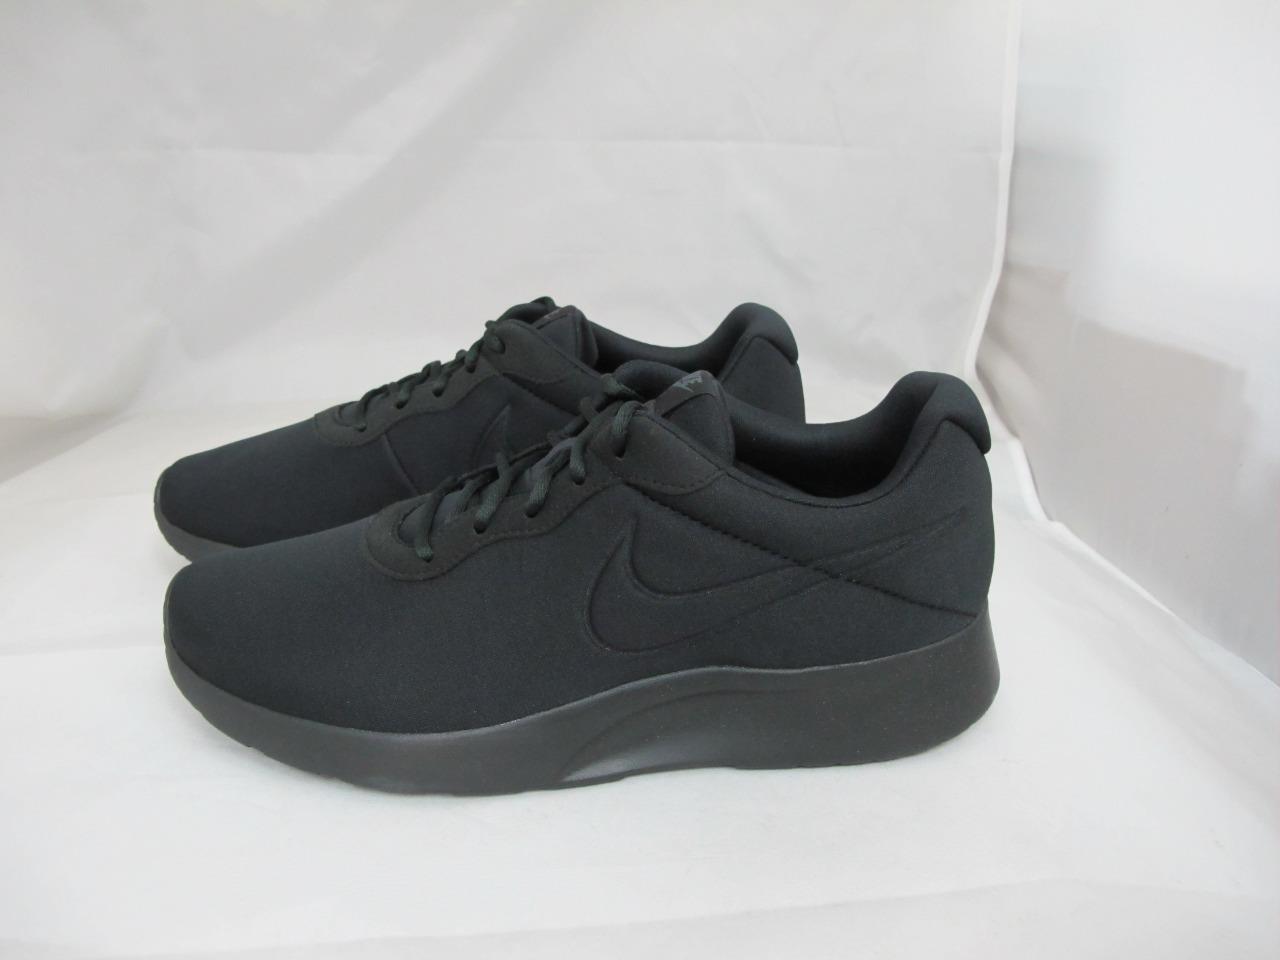 Nuevo Para Hombre Nike Tanjun Prem 876899-007